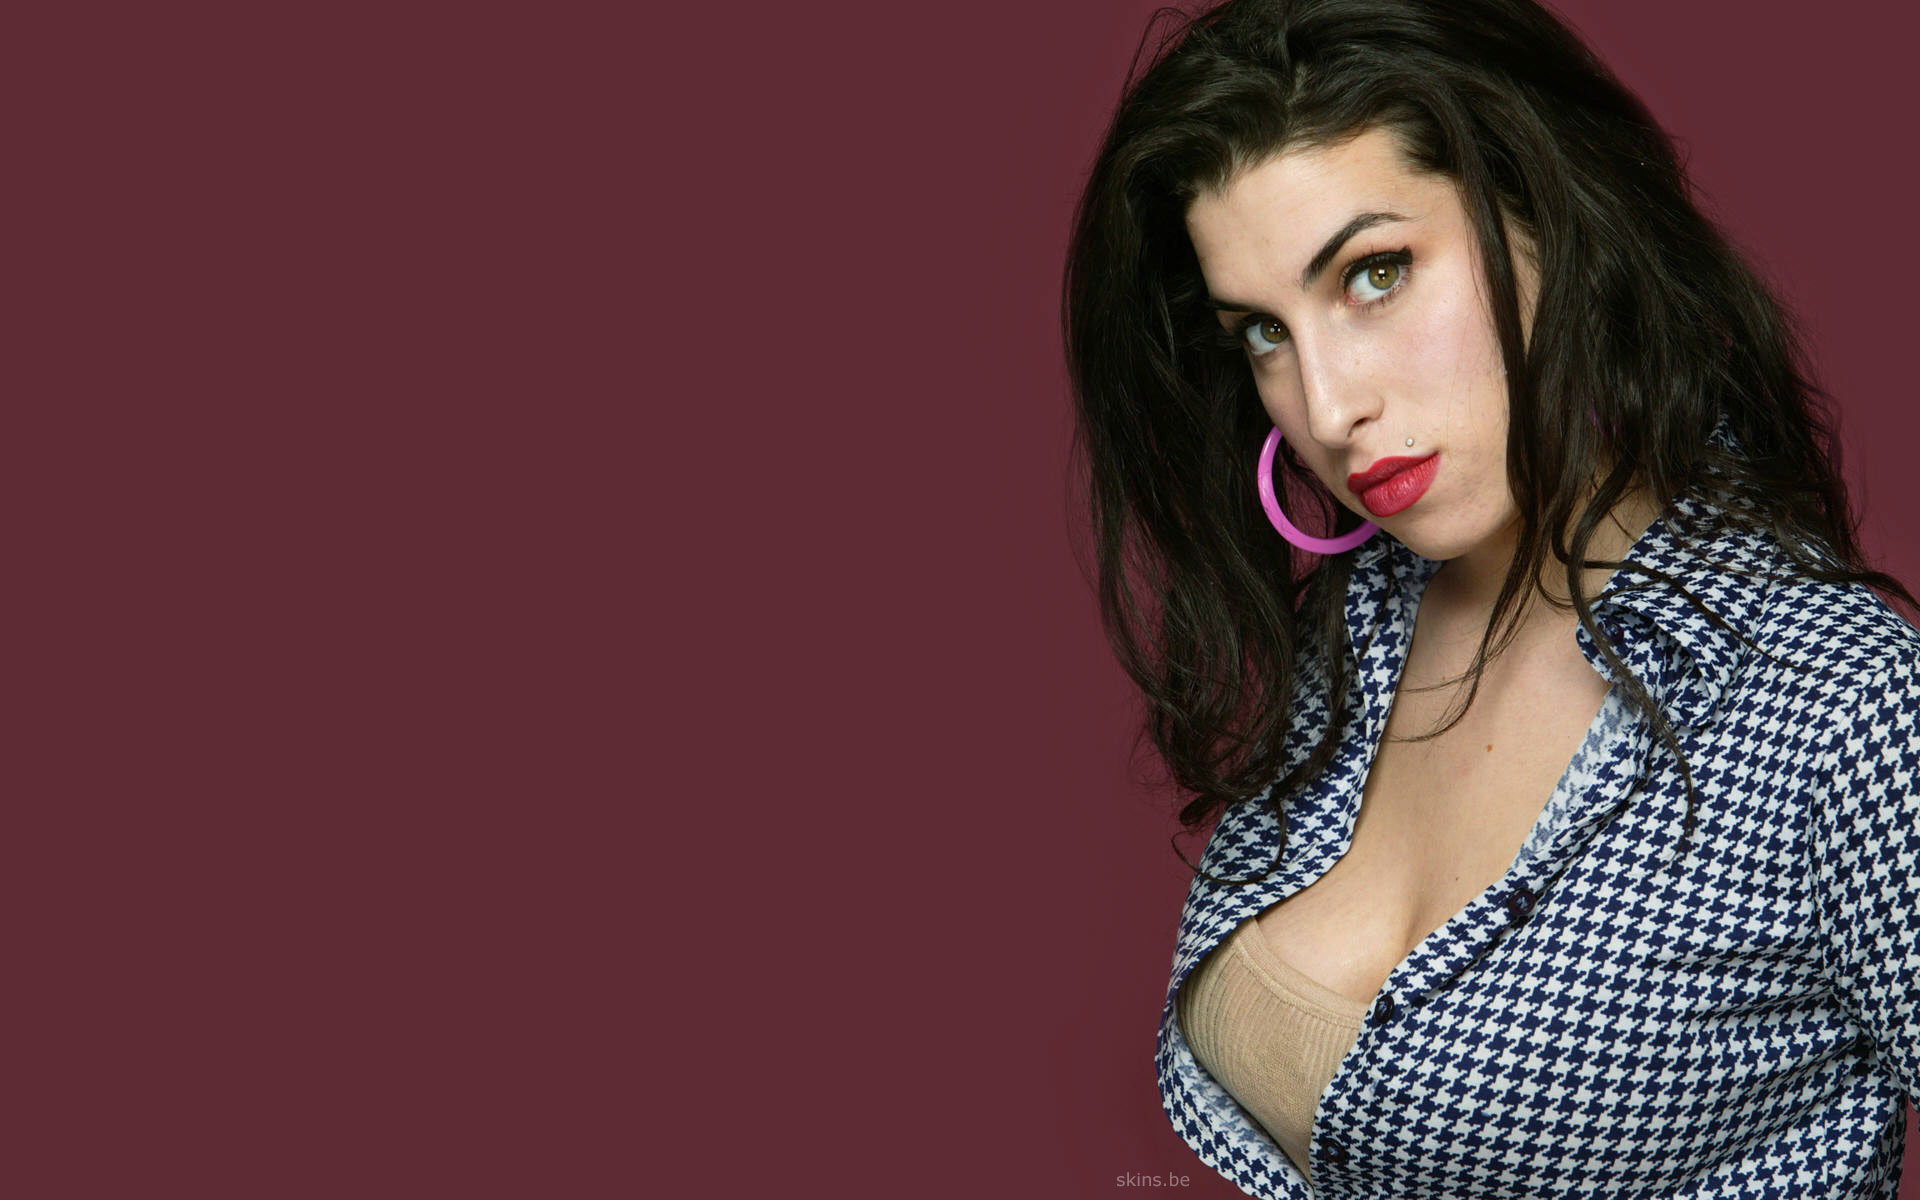 Amy Winehouse Wallpaper 1920x1200 61544